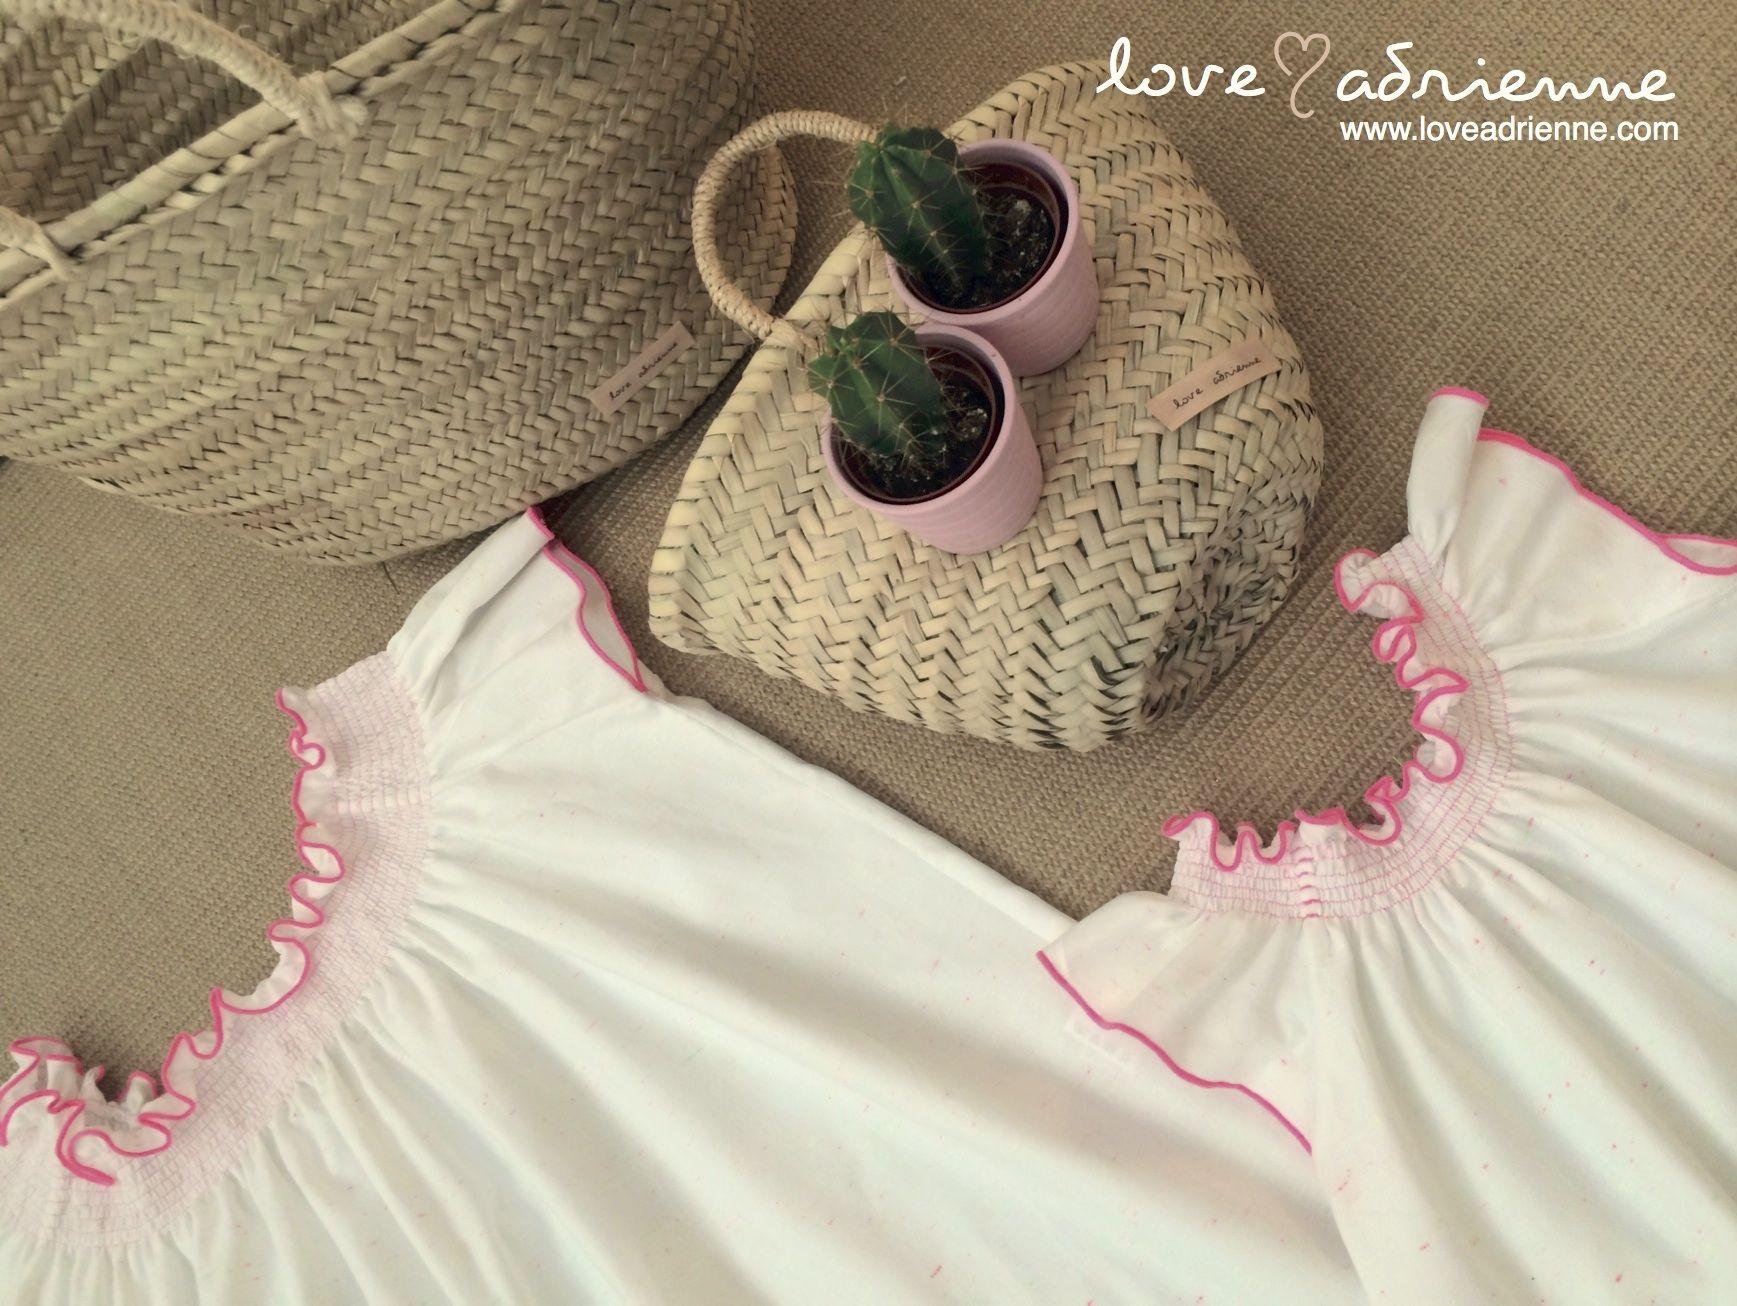 Love Adrienne//Primavera-Verano 17. Ideas #minime para vestir igual mujer y niña. #loveadrienne #primaveraverano2017